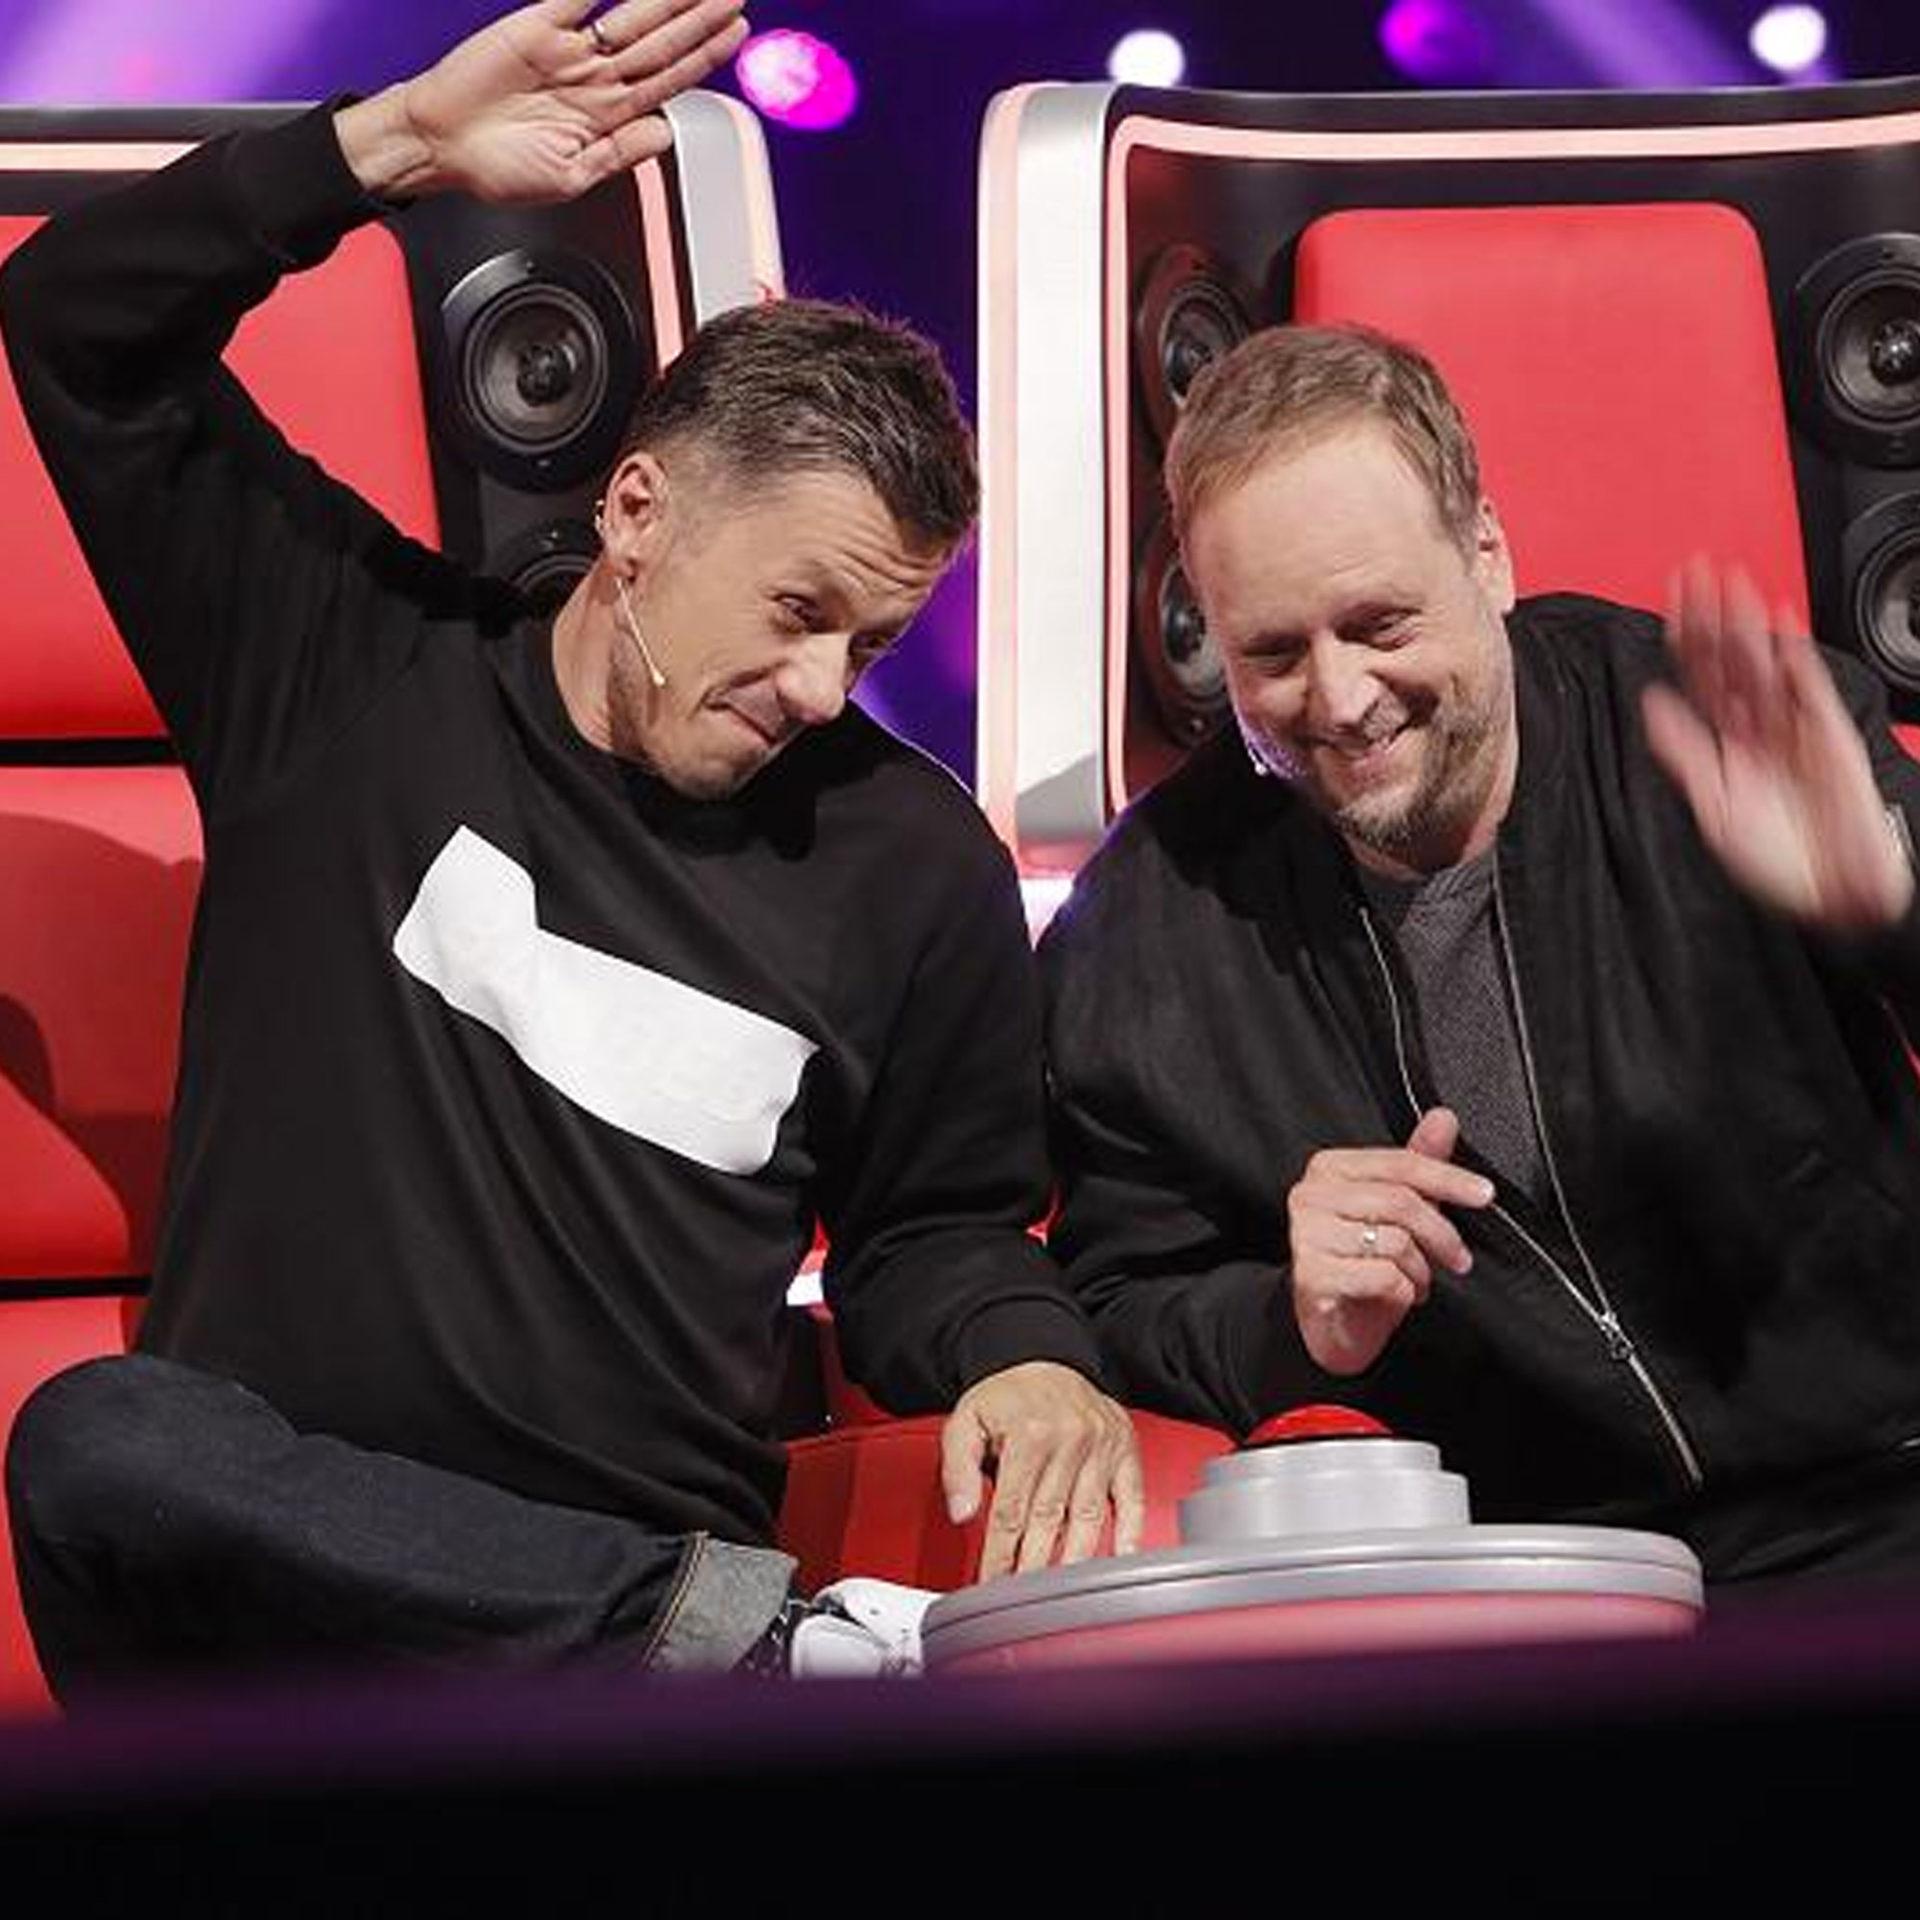 Michi Beck mit Beck-To-Beck Sweatshirt und Smudo bei The Voice of Germany